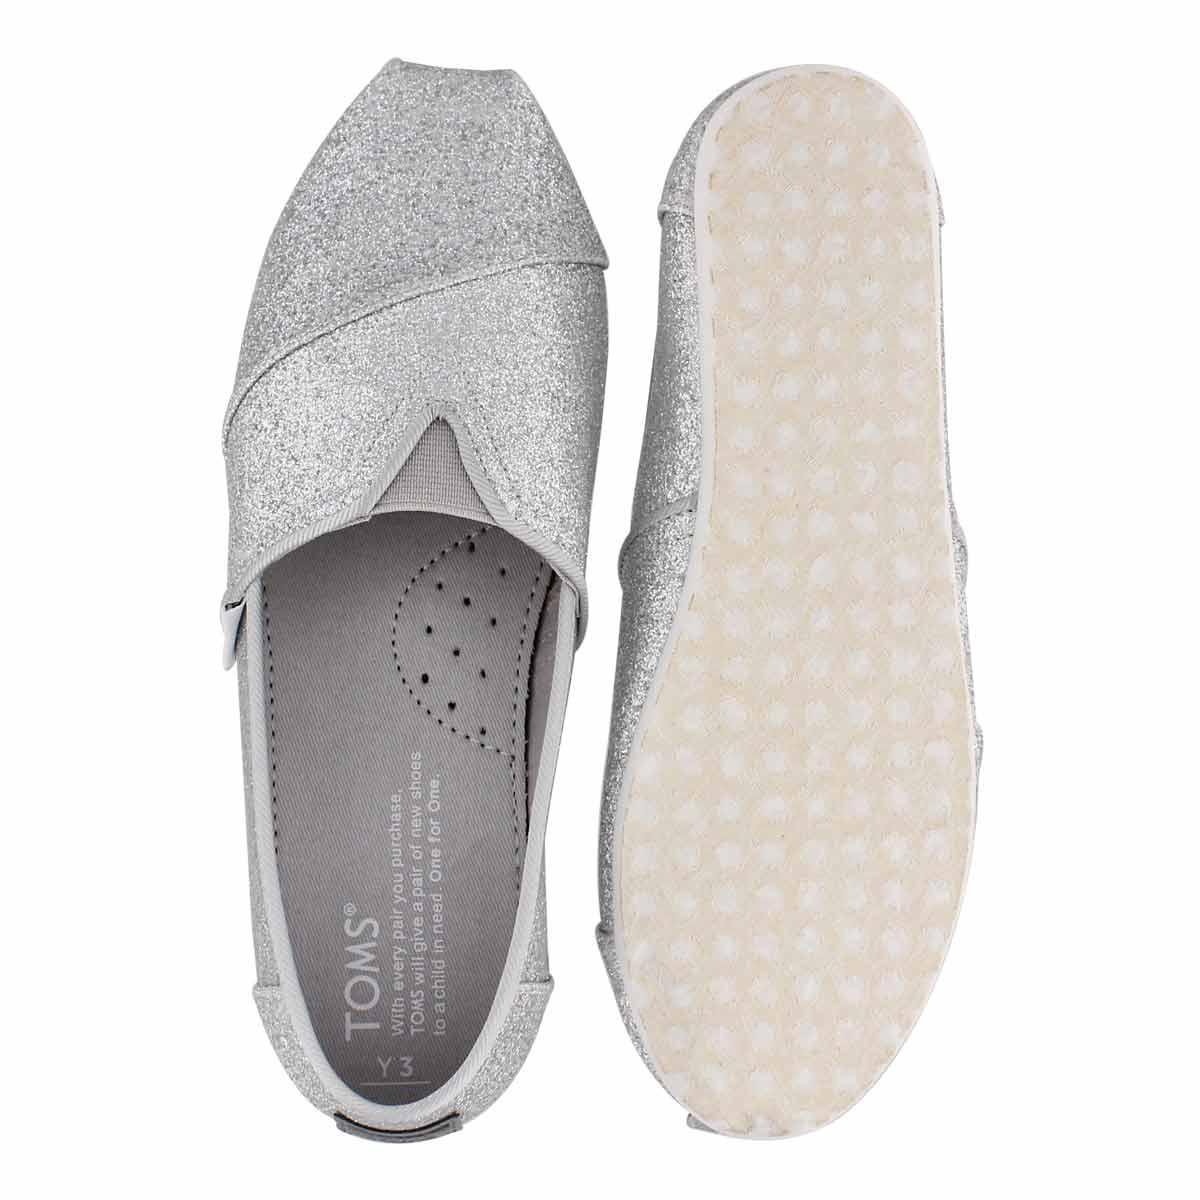 Grls Classic Seasonal slvr glmr loafer